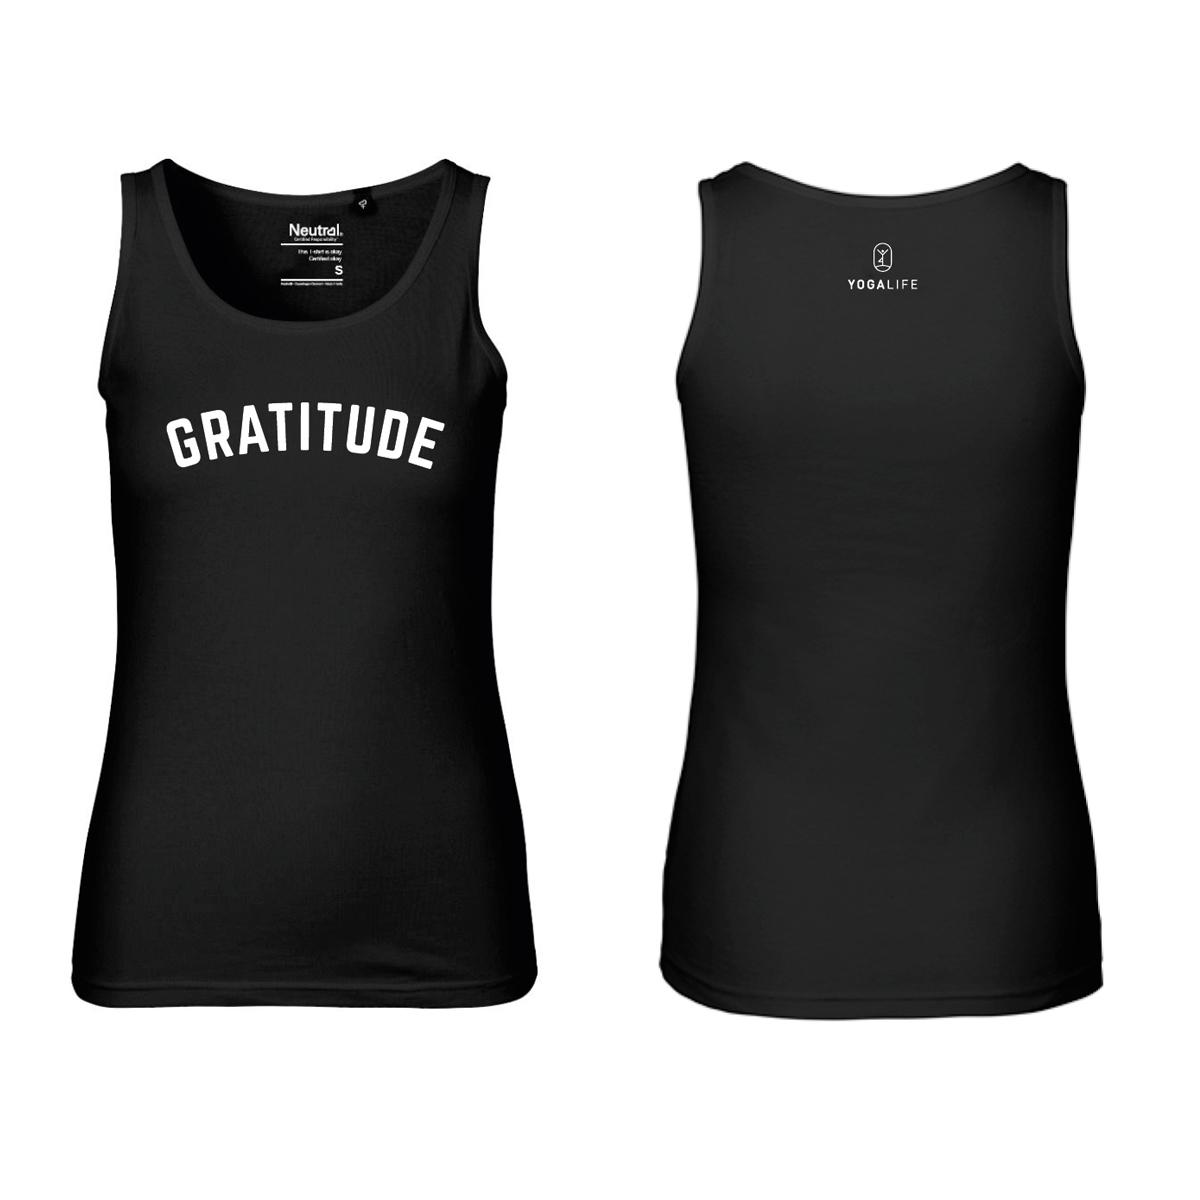 YOGALIFE Bio-Fairtrade-Top GRATITUDE